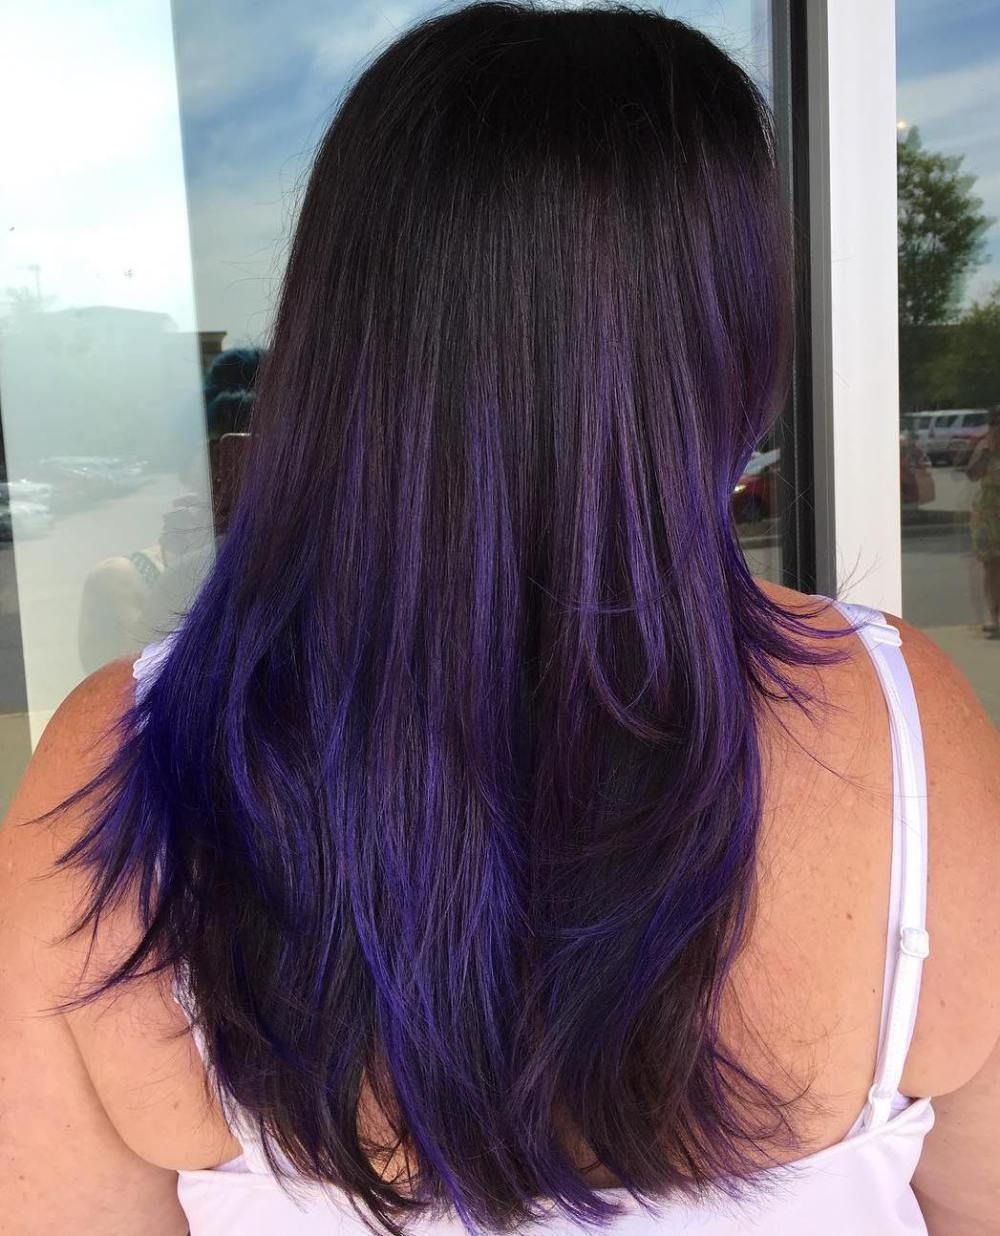 purple balayage ideas from subtle to vibrant purple balayage